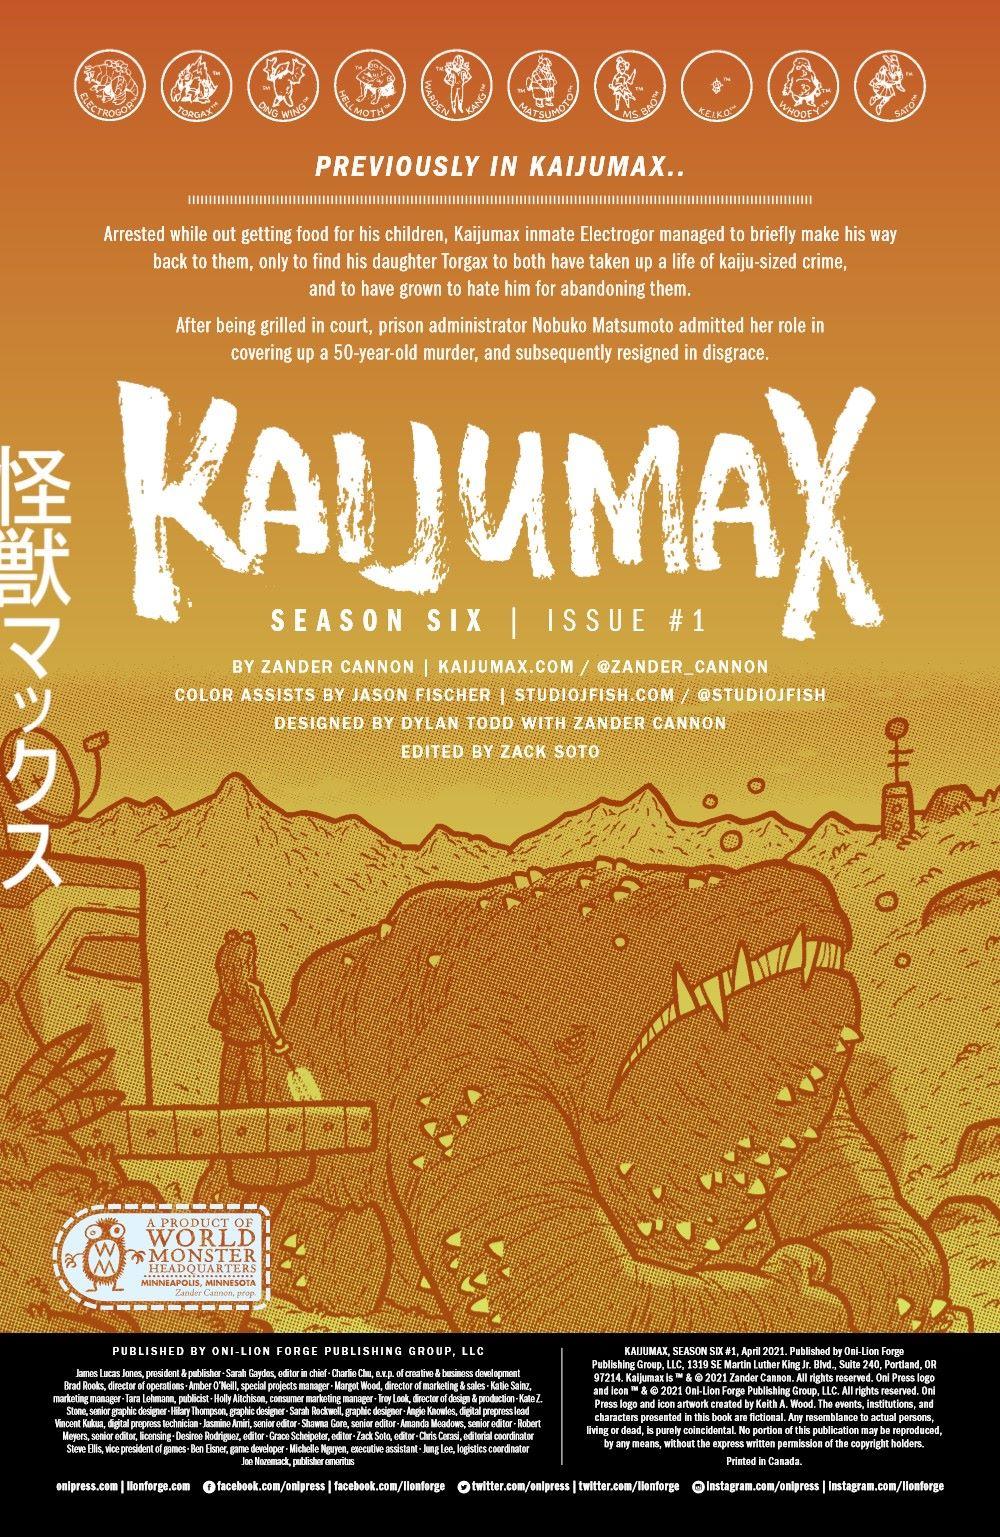 KAIJUMAXV6-1-MARKETING-02 ComicList Previews: KAIJUMAX SEASON SIX #1